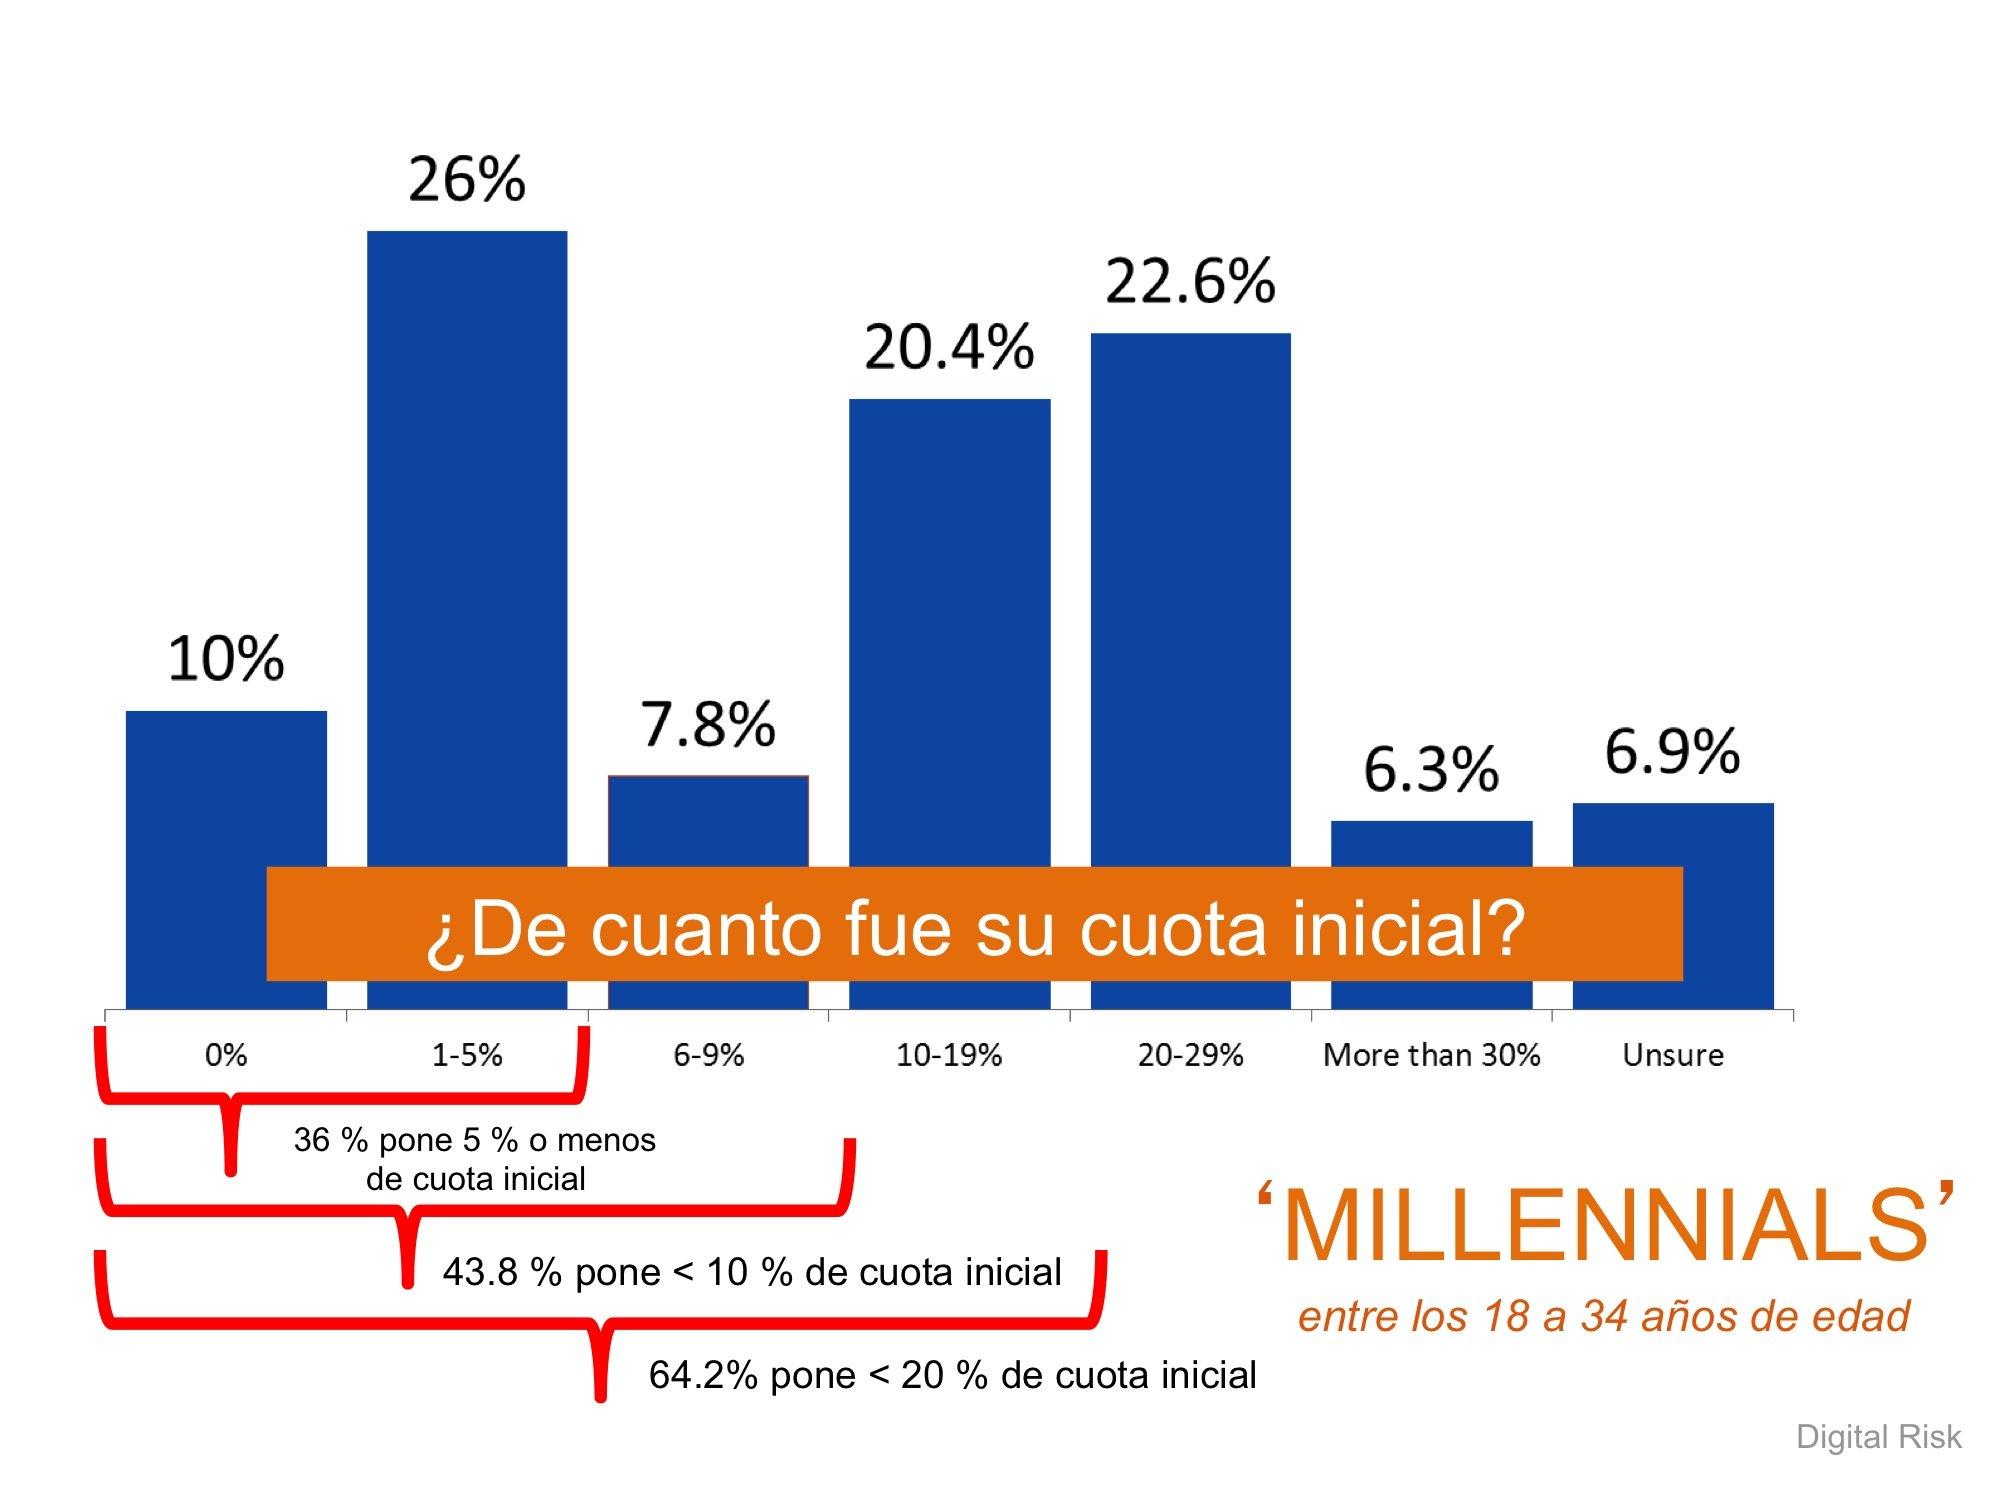 Los 'Millennials' & la cuota inicial - Simplifying The Market